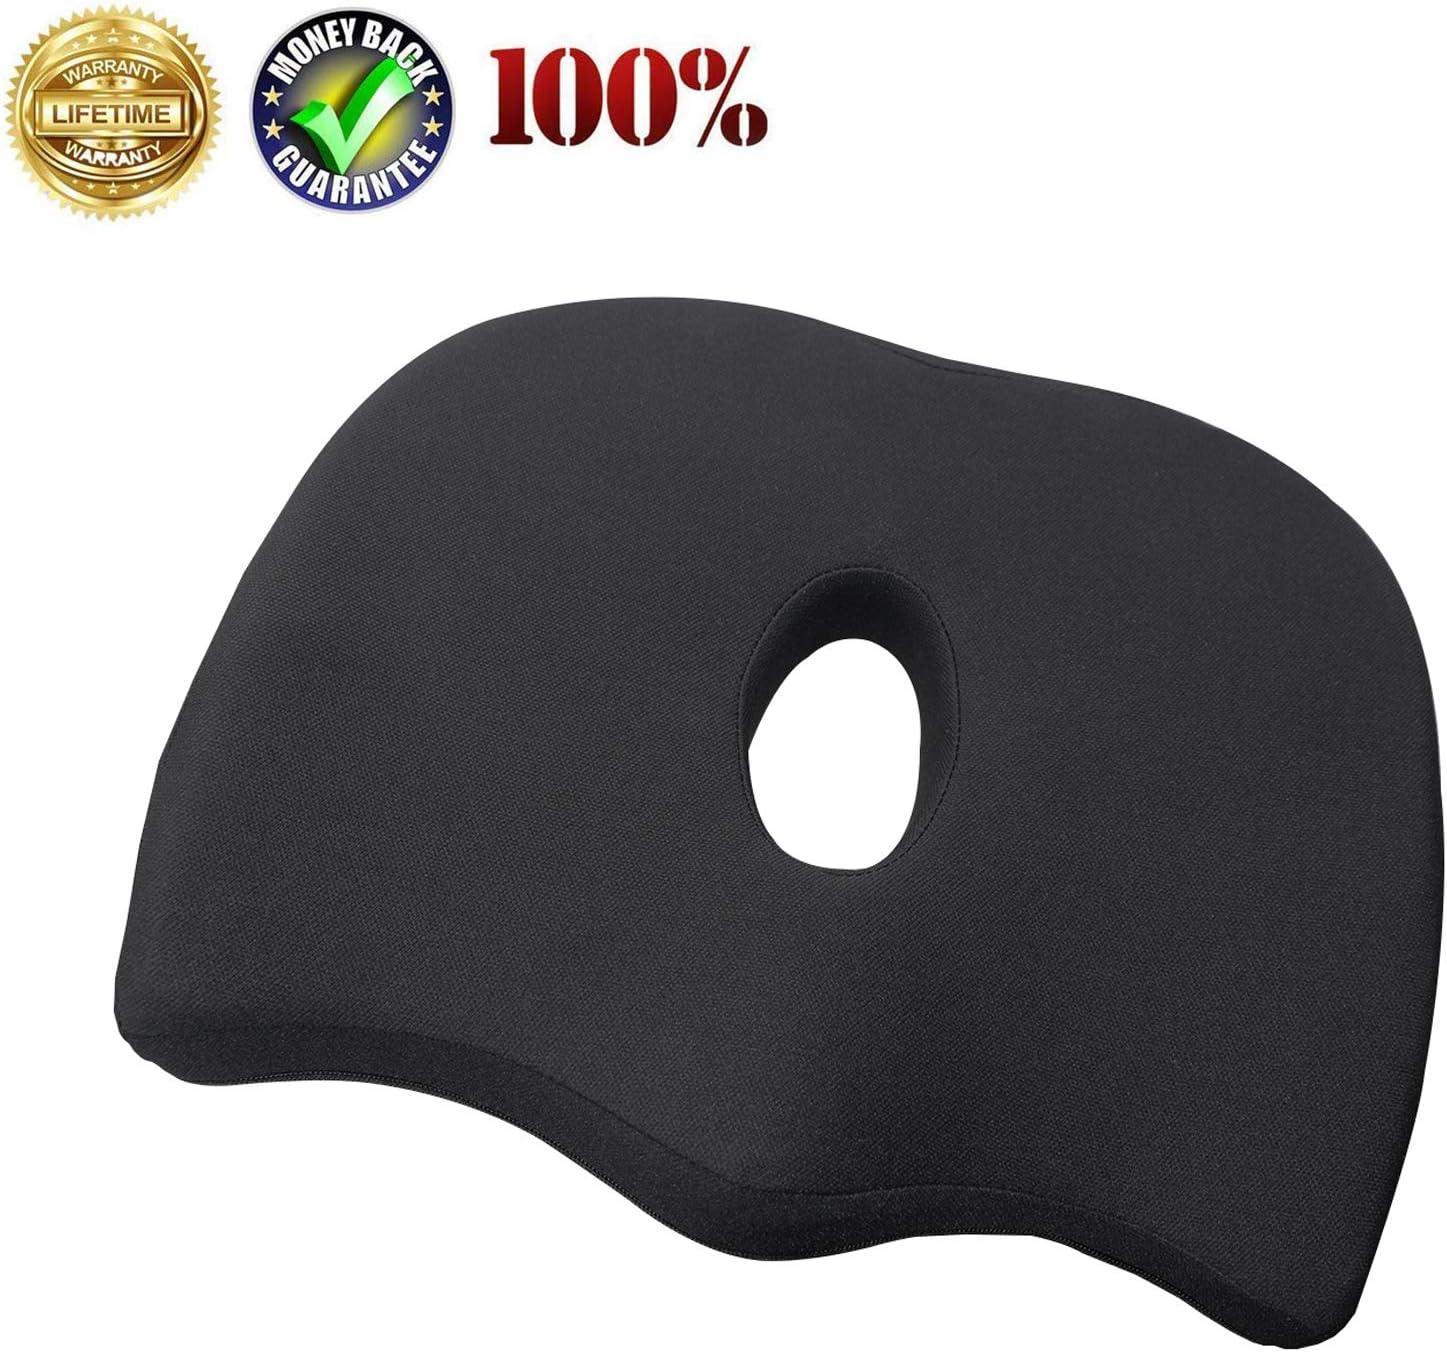 Uhealer Premium Comfort Seat Cushion Non-Slip Orthopedic Memory Foam Coccyx Cushion for Tailbone Pain Cushion for Office Chair Car Seat Back Pain Sciatica Relief